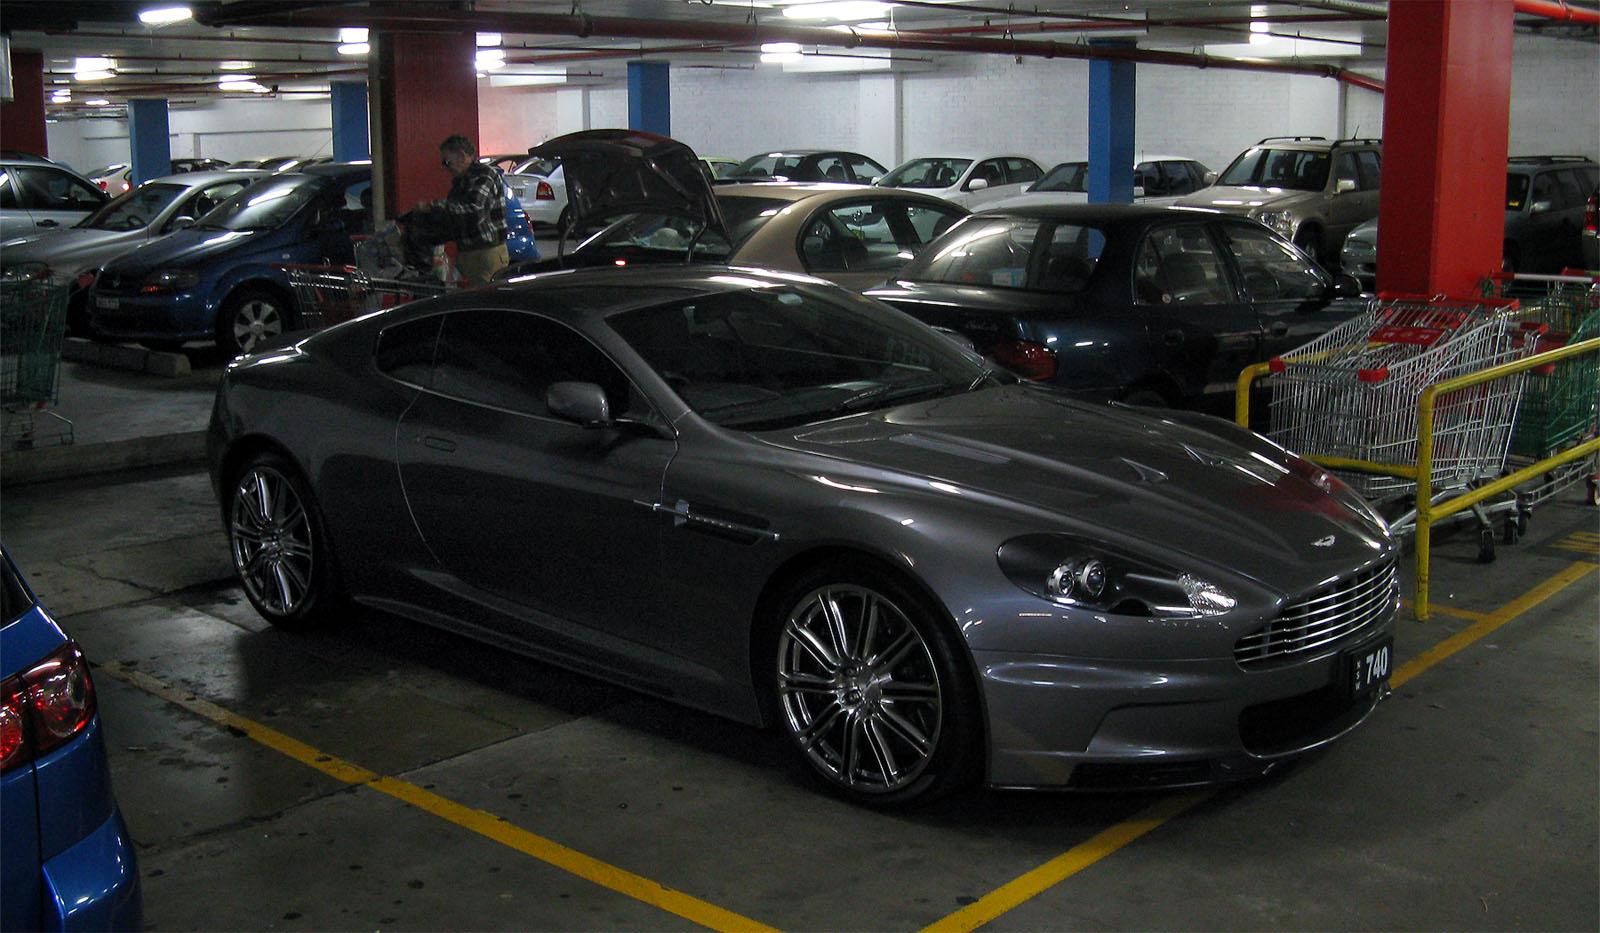 110531 - Aston Martin